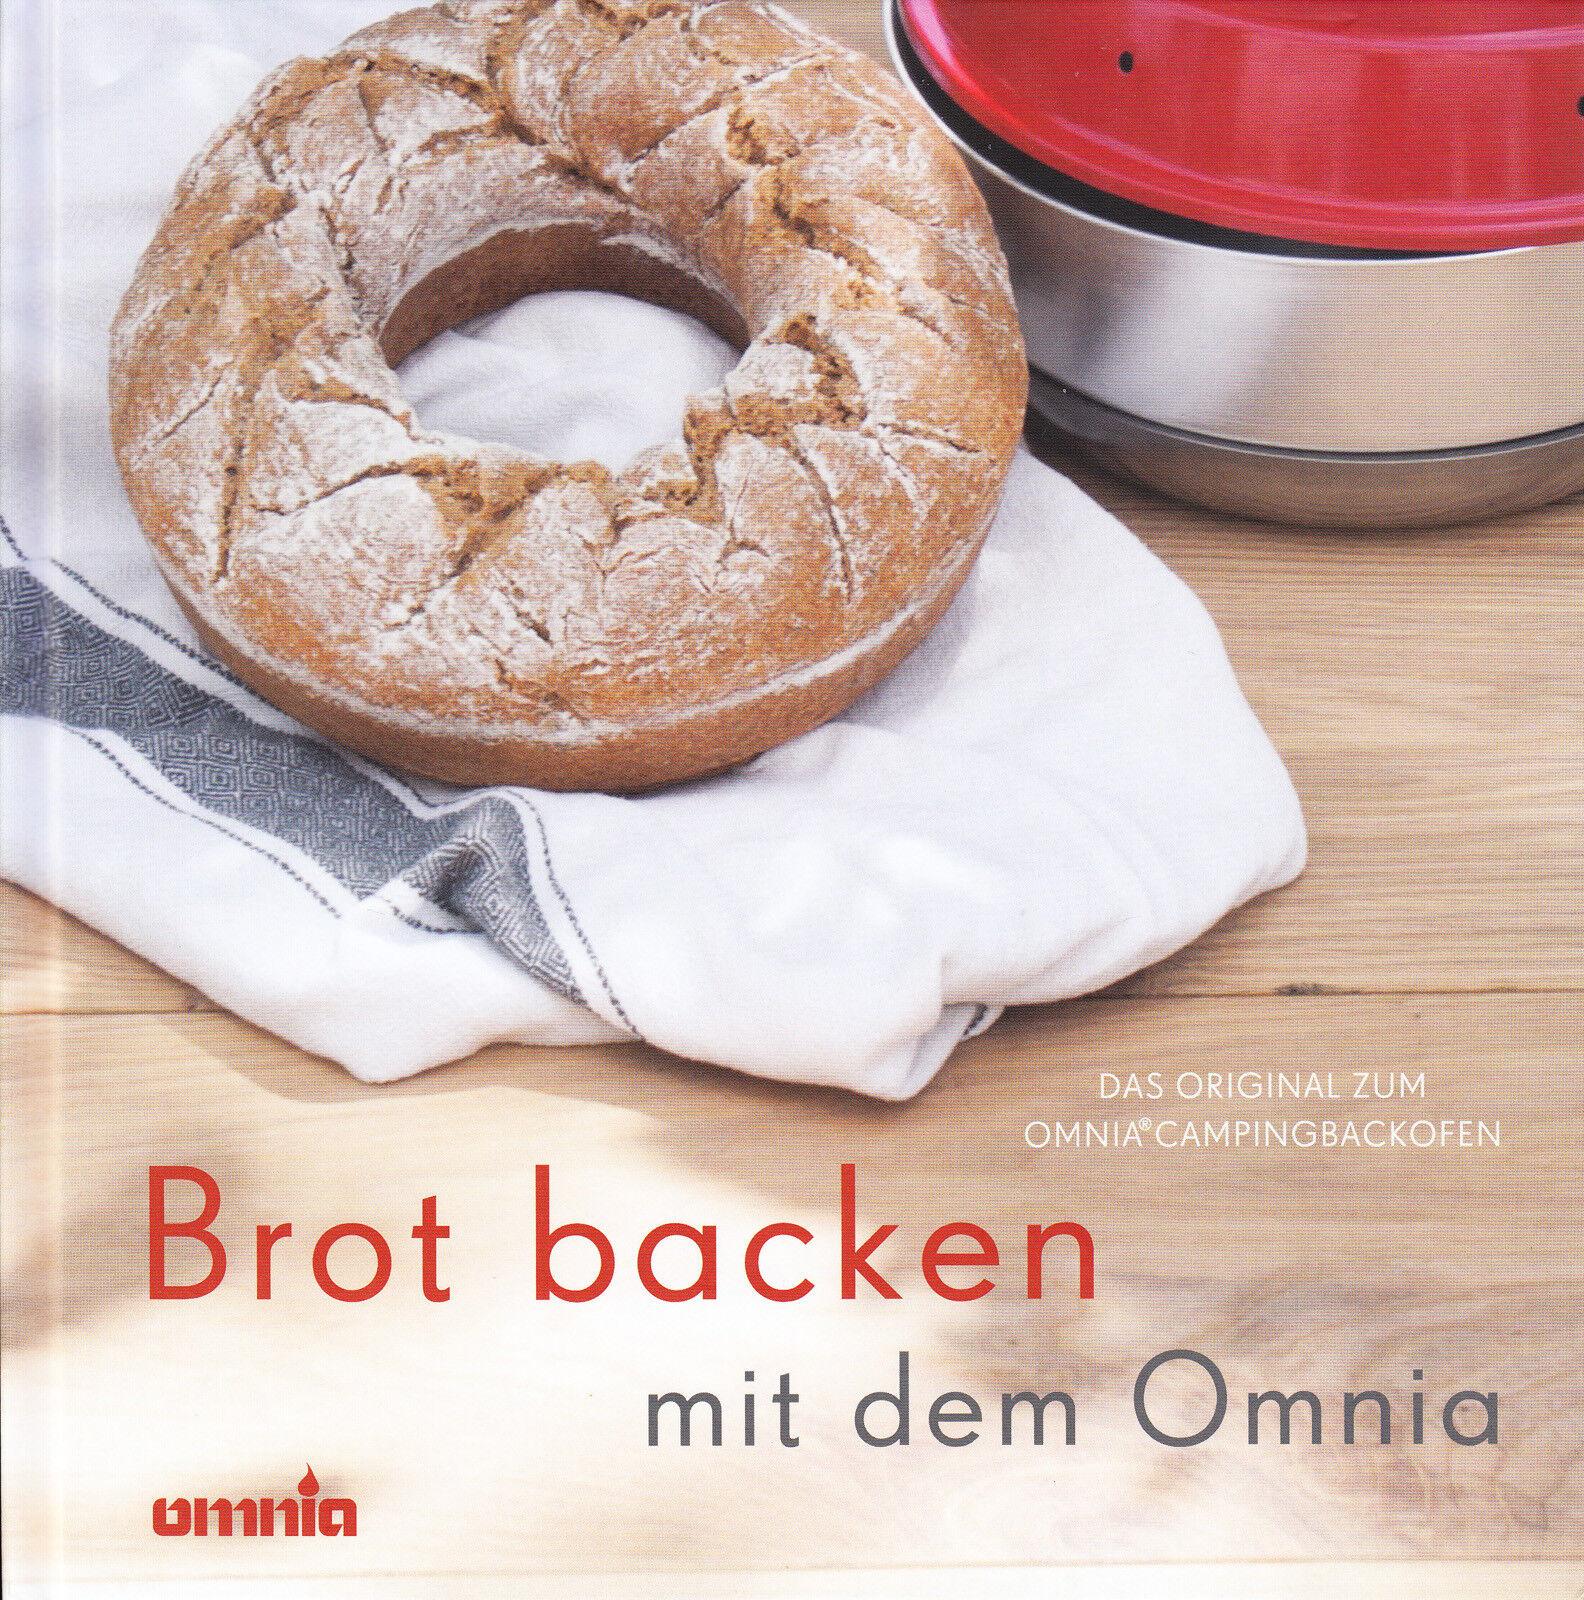 OMNIA Das Backbuch - Brot backen mit dem original Omnia Campingbackofen Kochbuch